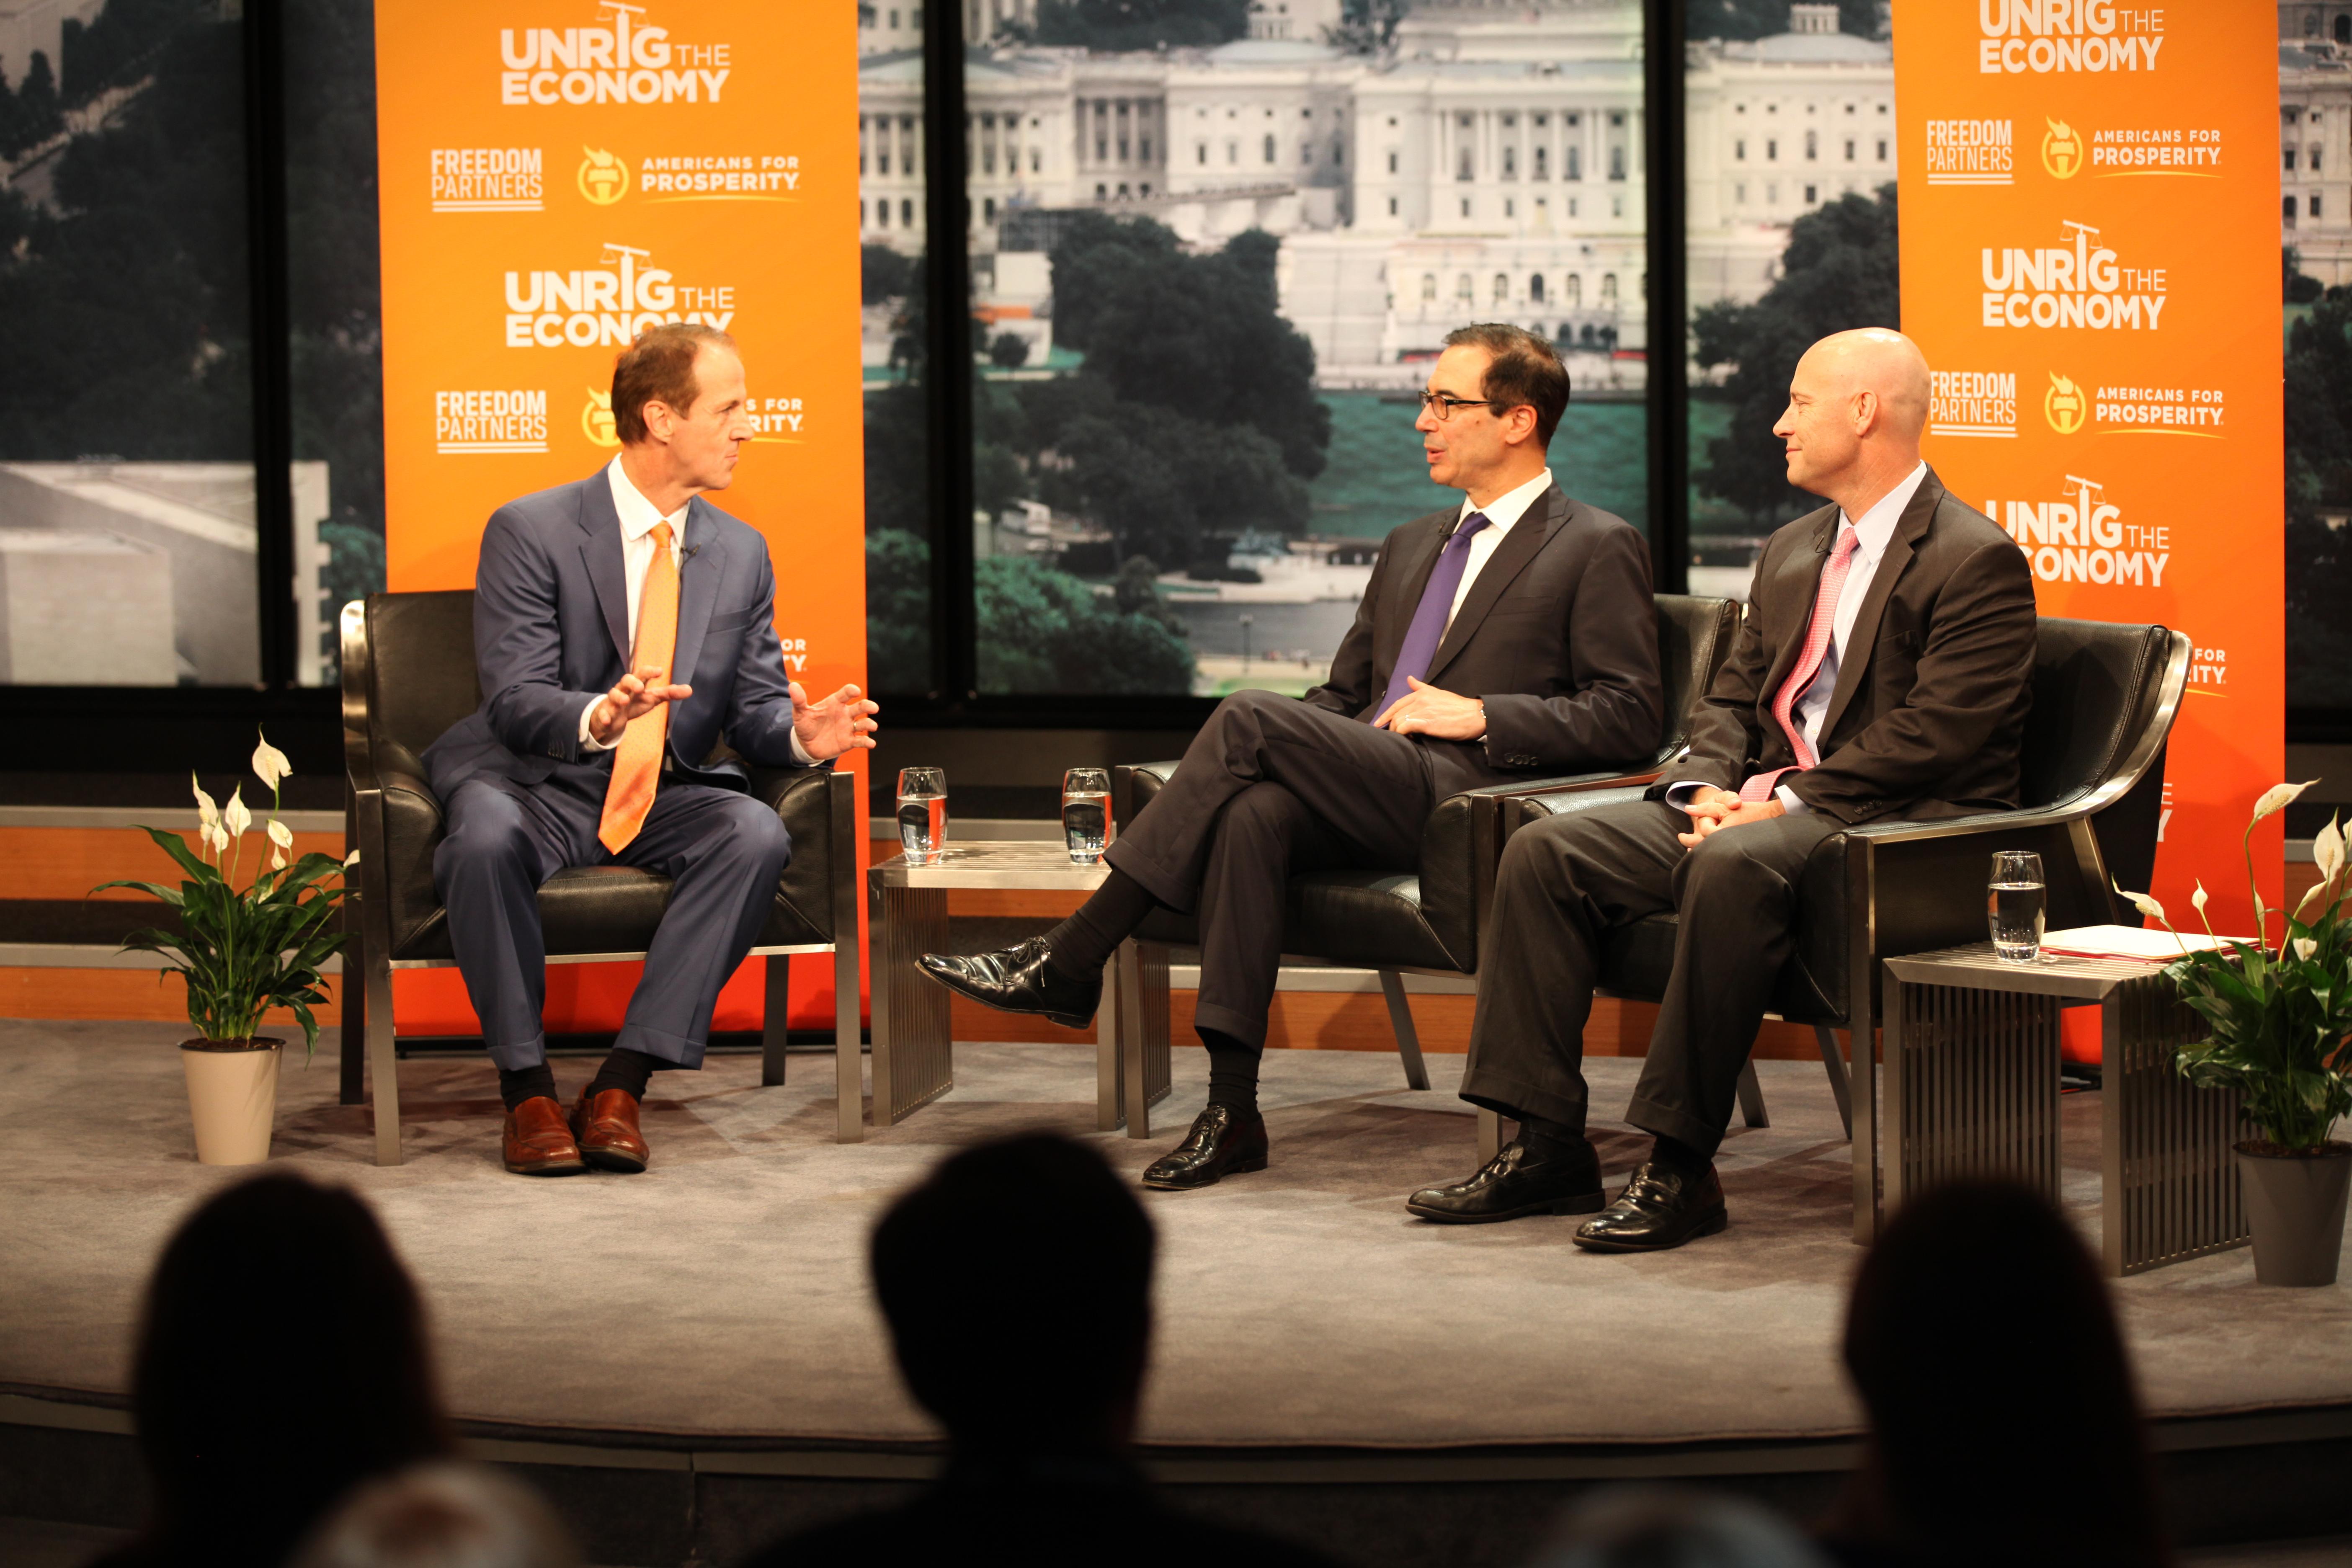 Americans for Prosperity President Tim Philips, Treasury Secretary Steve Mnuchin and White House Legislative Affairs Director Marc Short